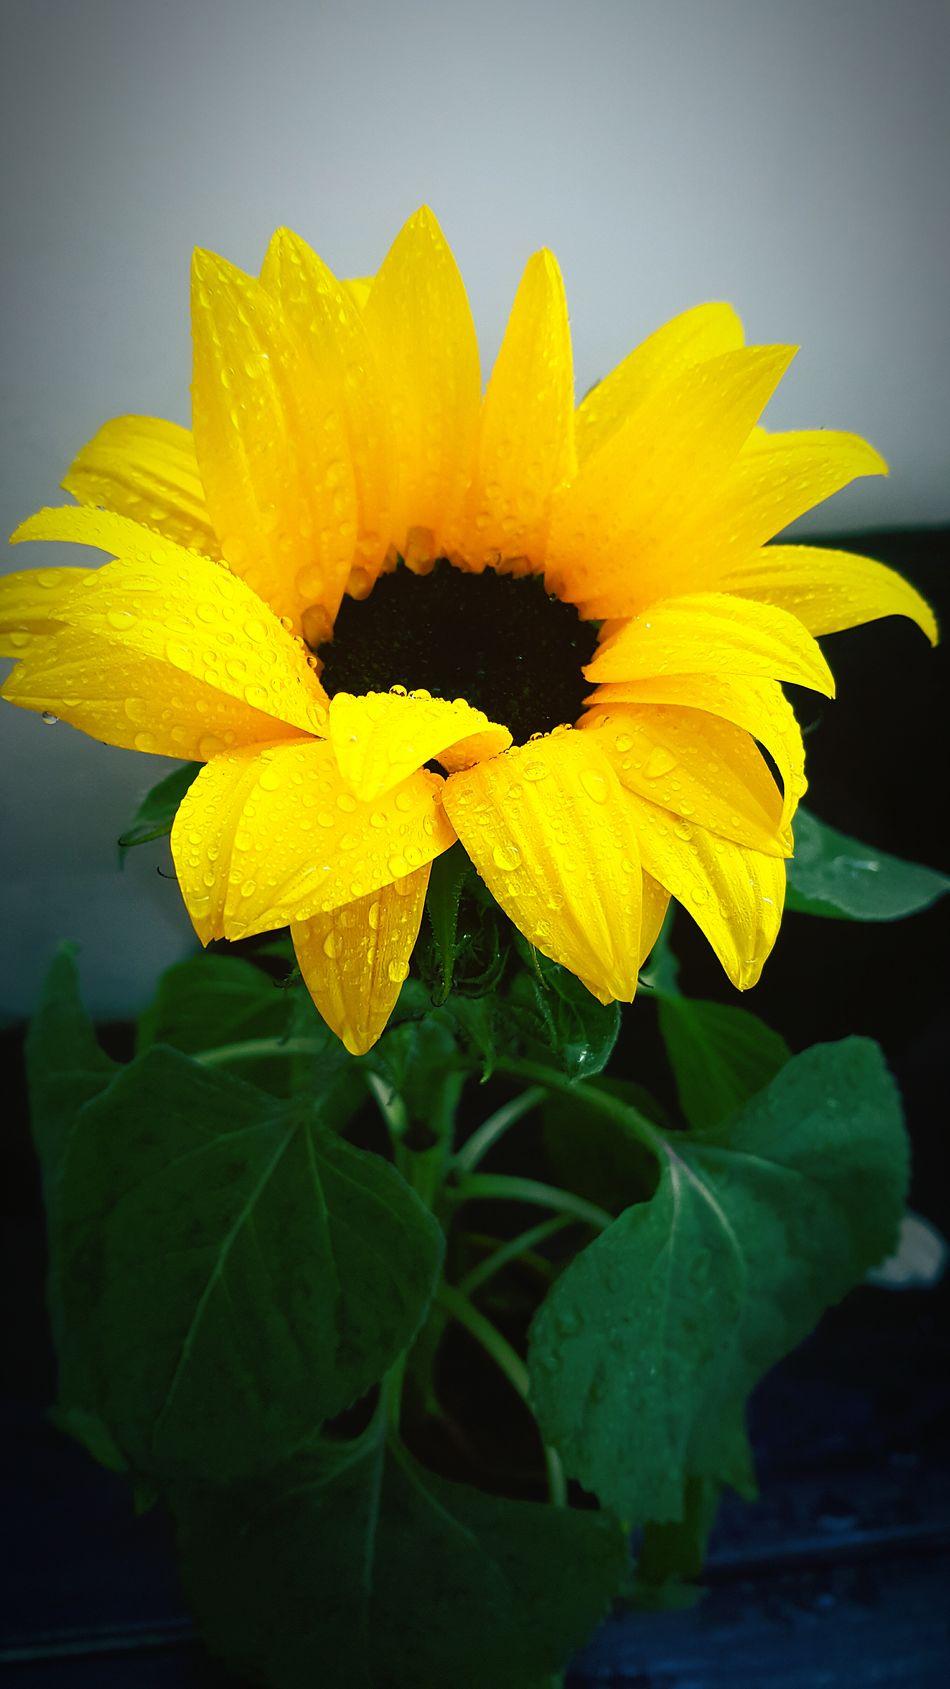 Kwiaty Słonecznik Balkon Beautyful  Yellow Yellow Flower Flower Photography Flowers, Nature And Beauty Flower Sunflower🌻 Plants 🌱 Drewdrop Drew Drops